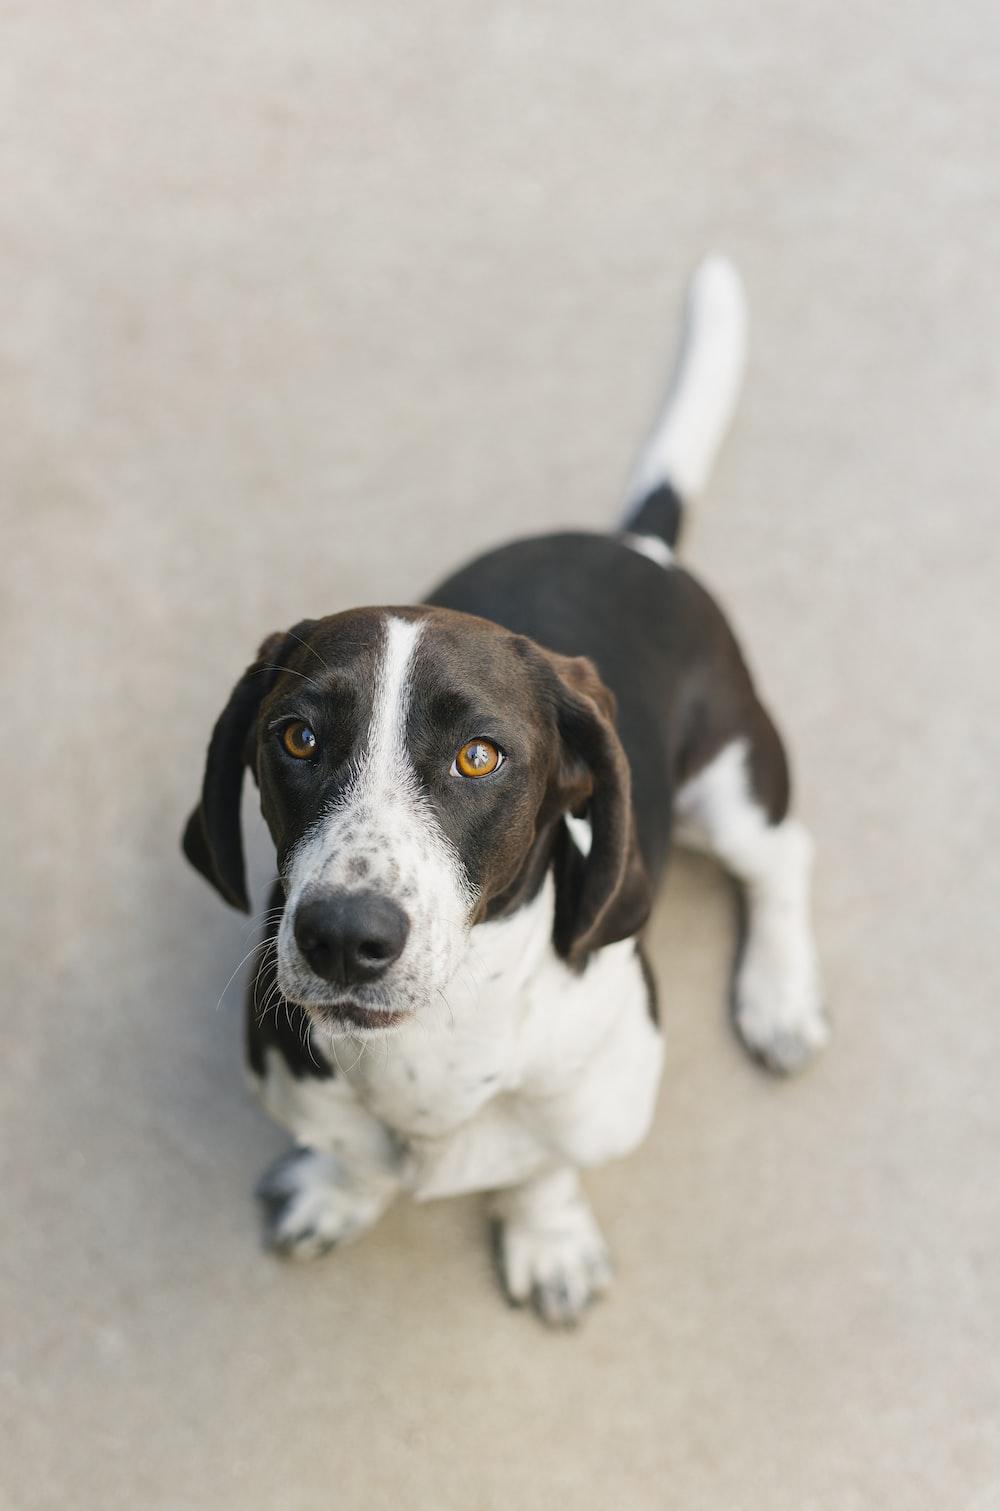 macro shot of brown and white dog